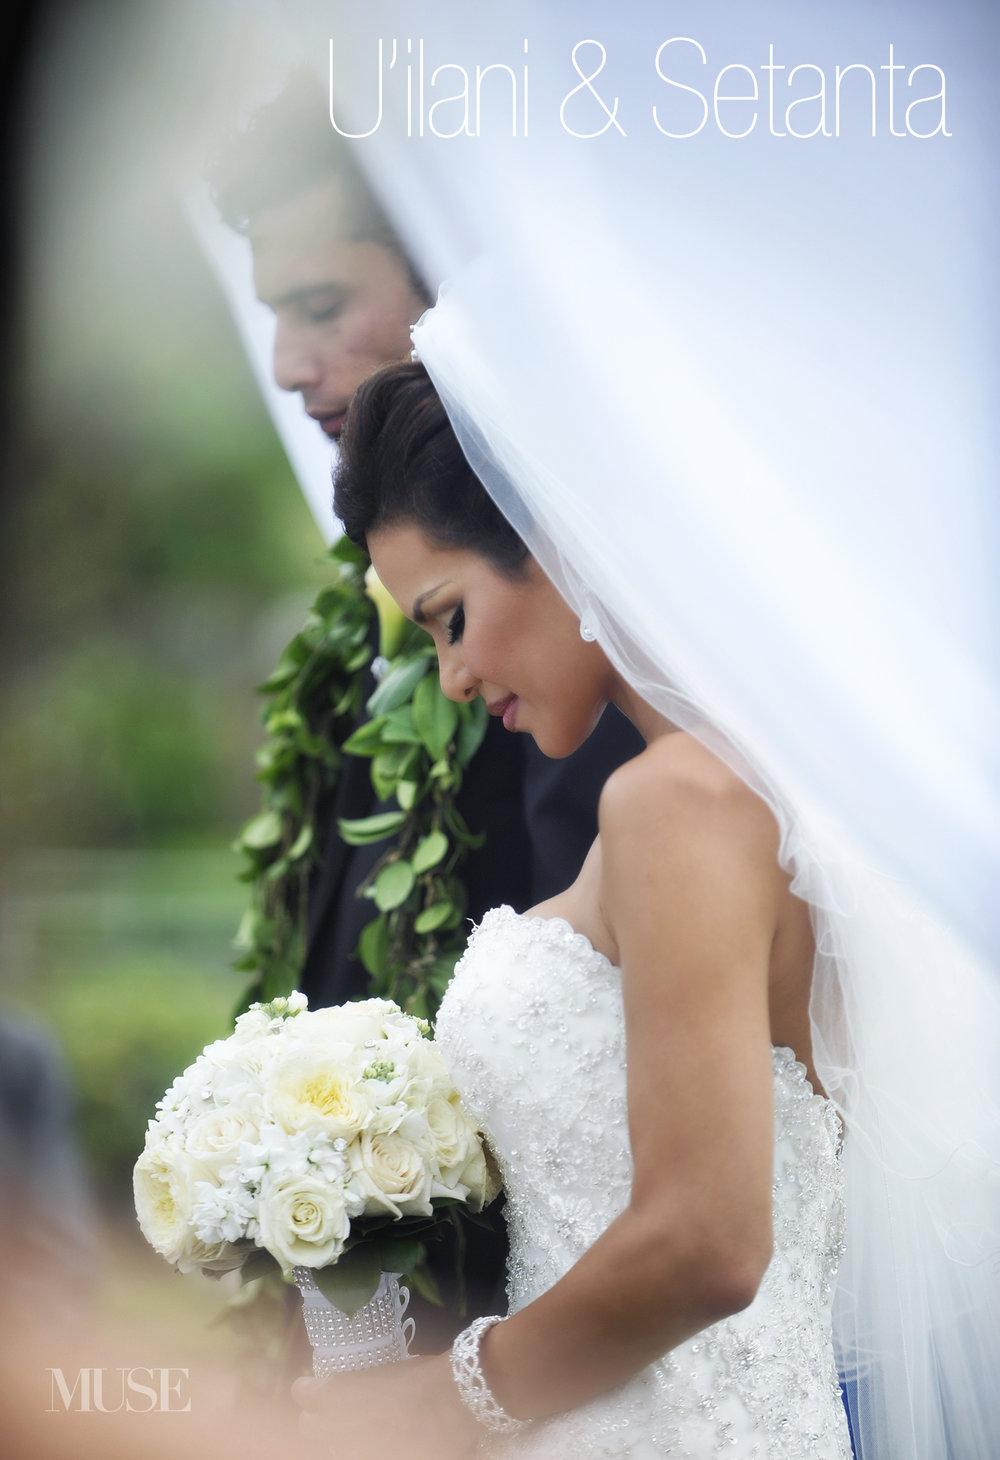 MUSE Bride Lookbook - Brides . U'ilani